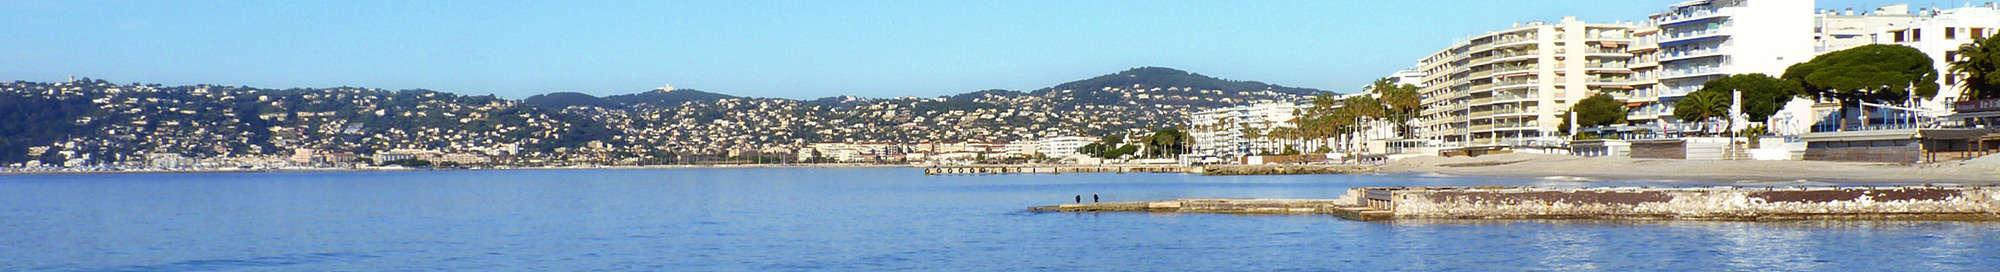 Week-end et séjour à Antibes